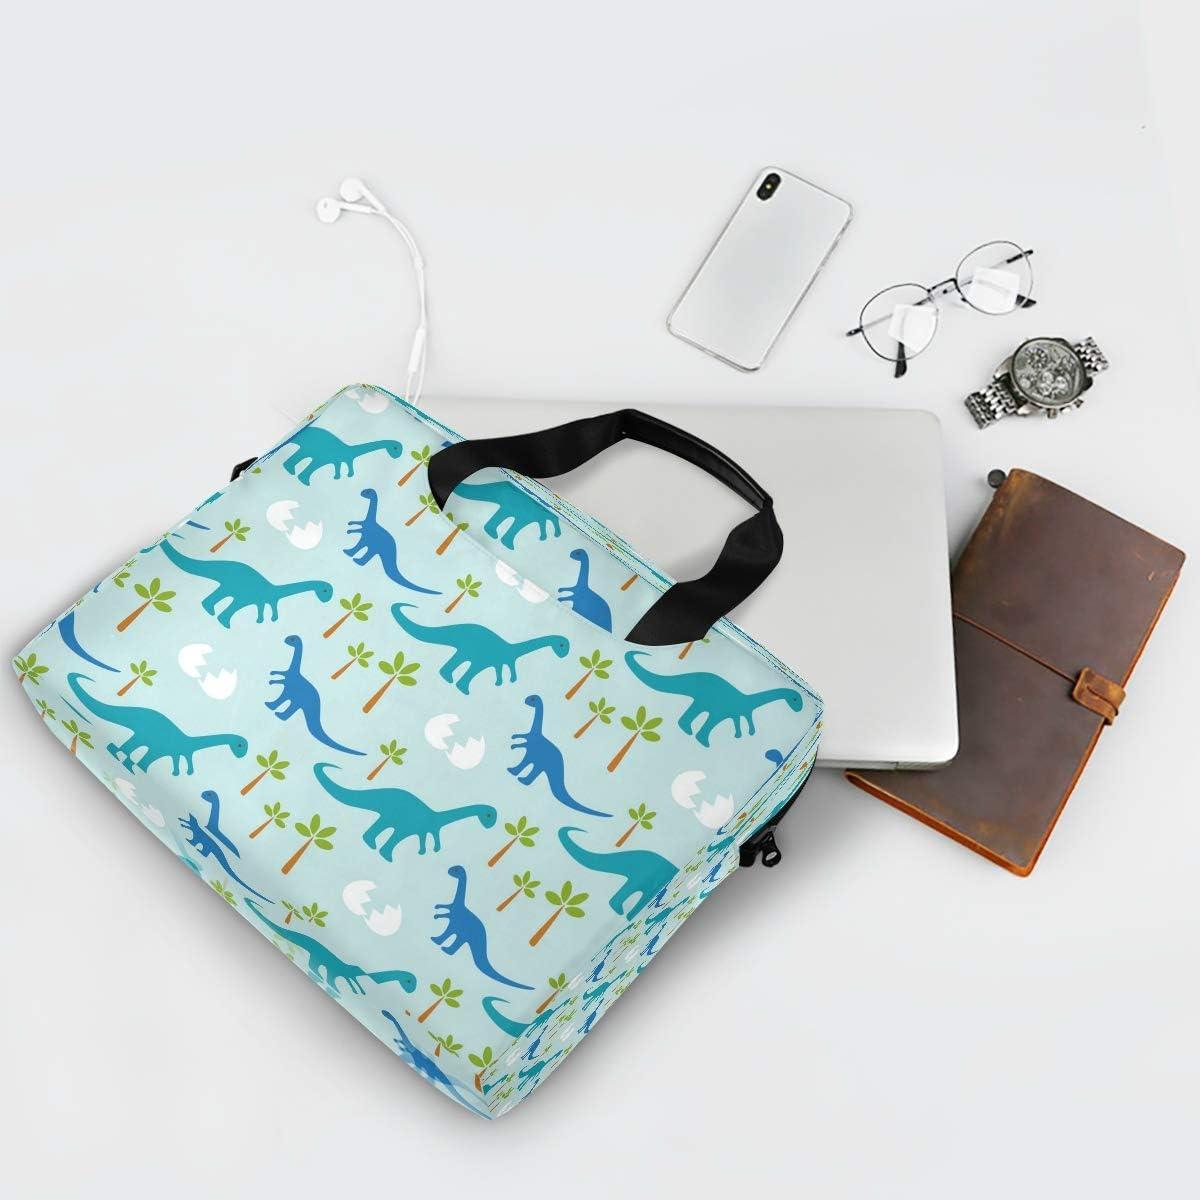 BETTKEN Laptop Case Sleeve Animal Dinosaur Tree Paw Pattern 15-16 inch Briefcase Travel Tote Messenger Notebook Computer Crossbody Bag with Strap Handle for Women Men